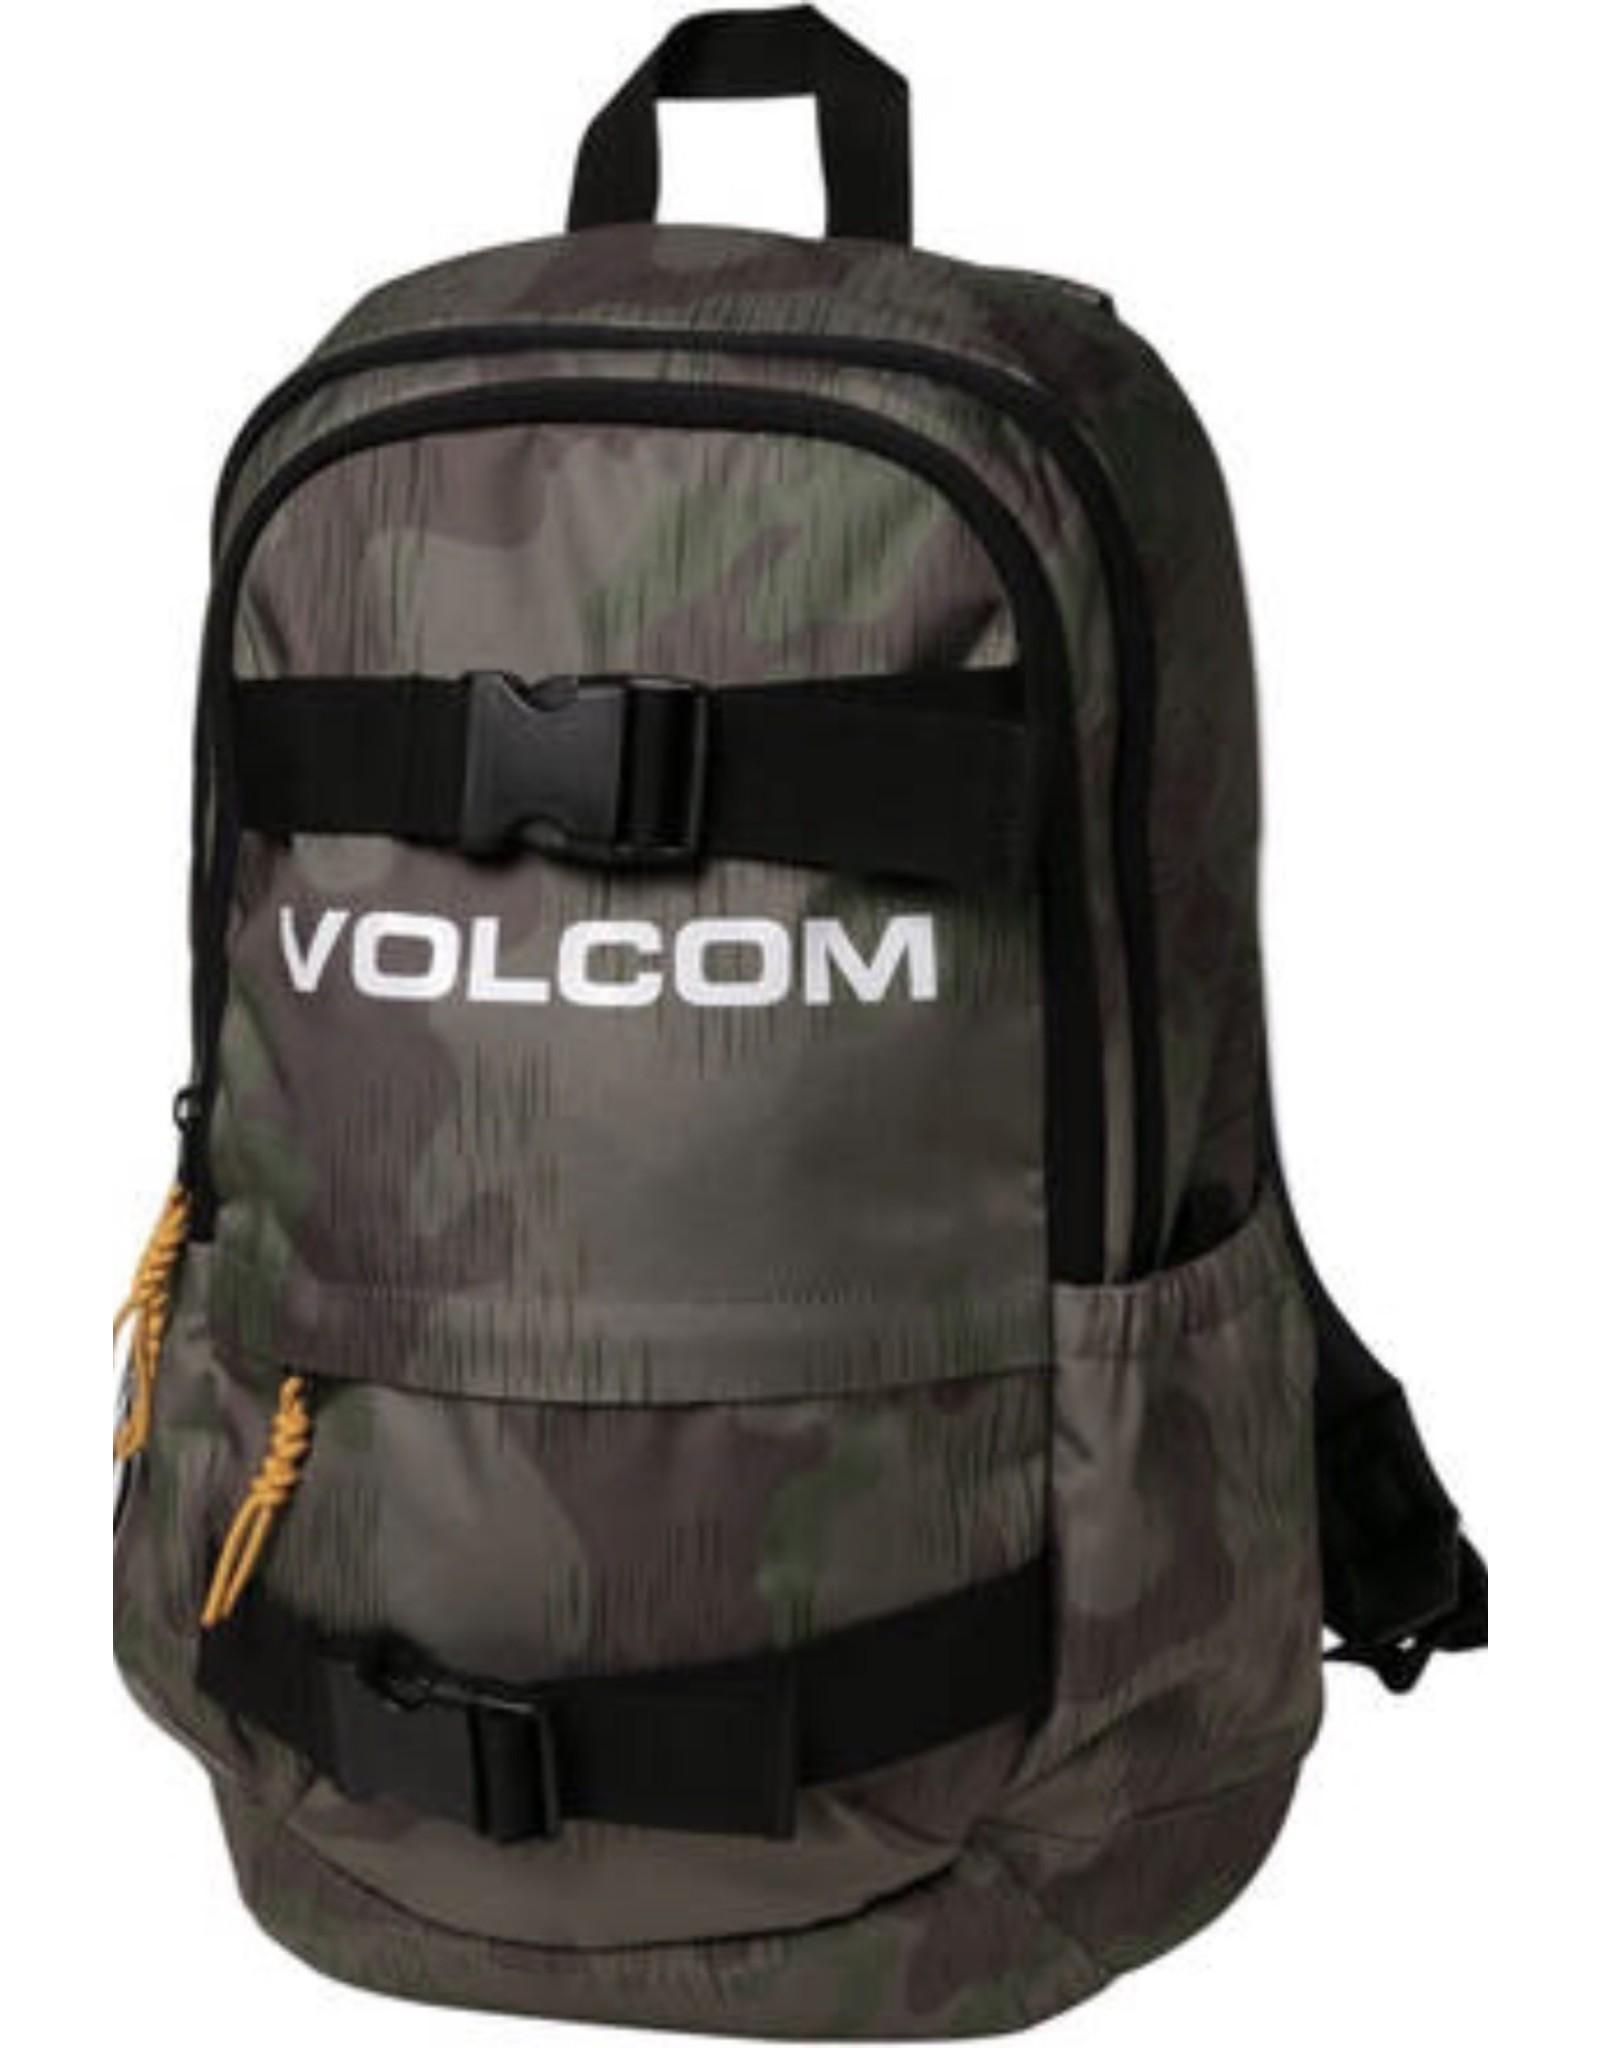 VOLCOM Substrate III